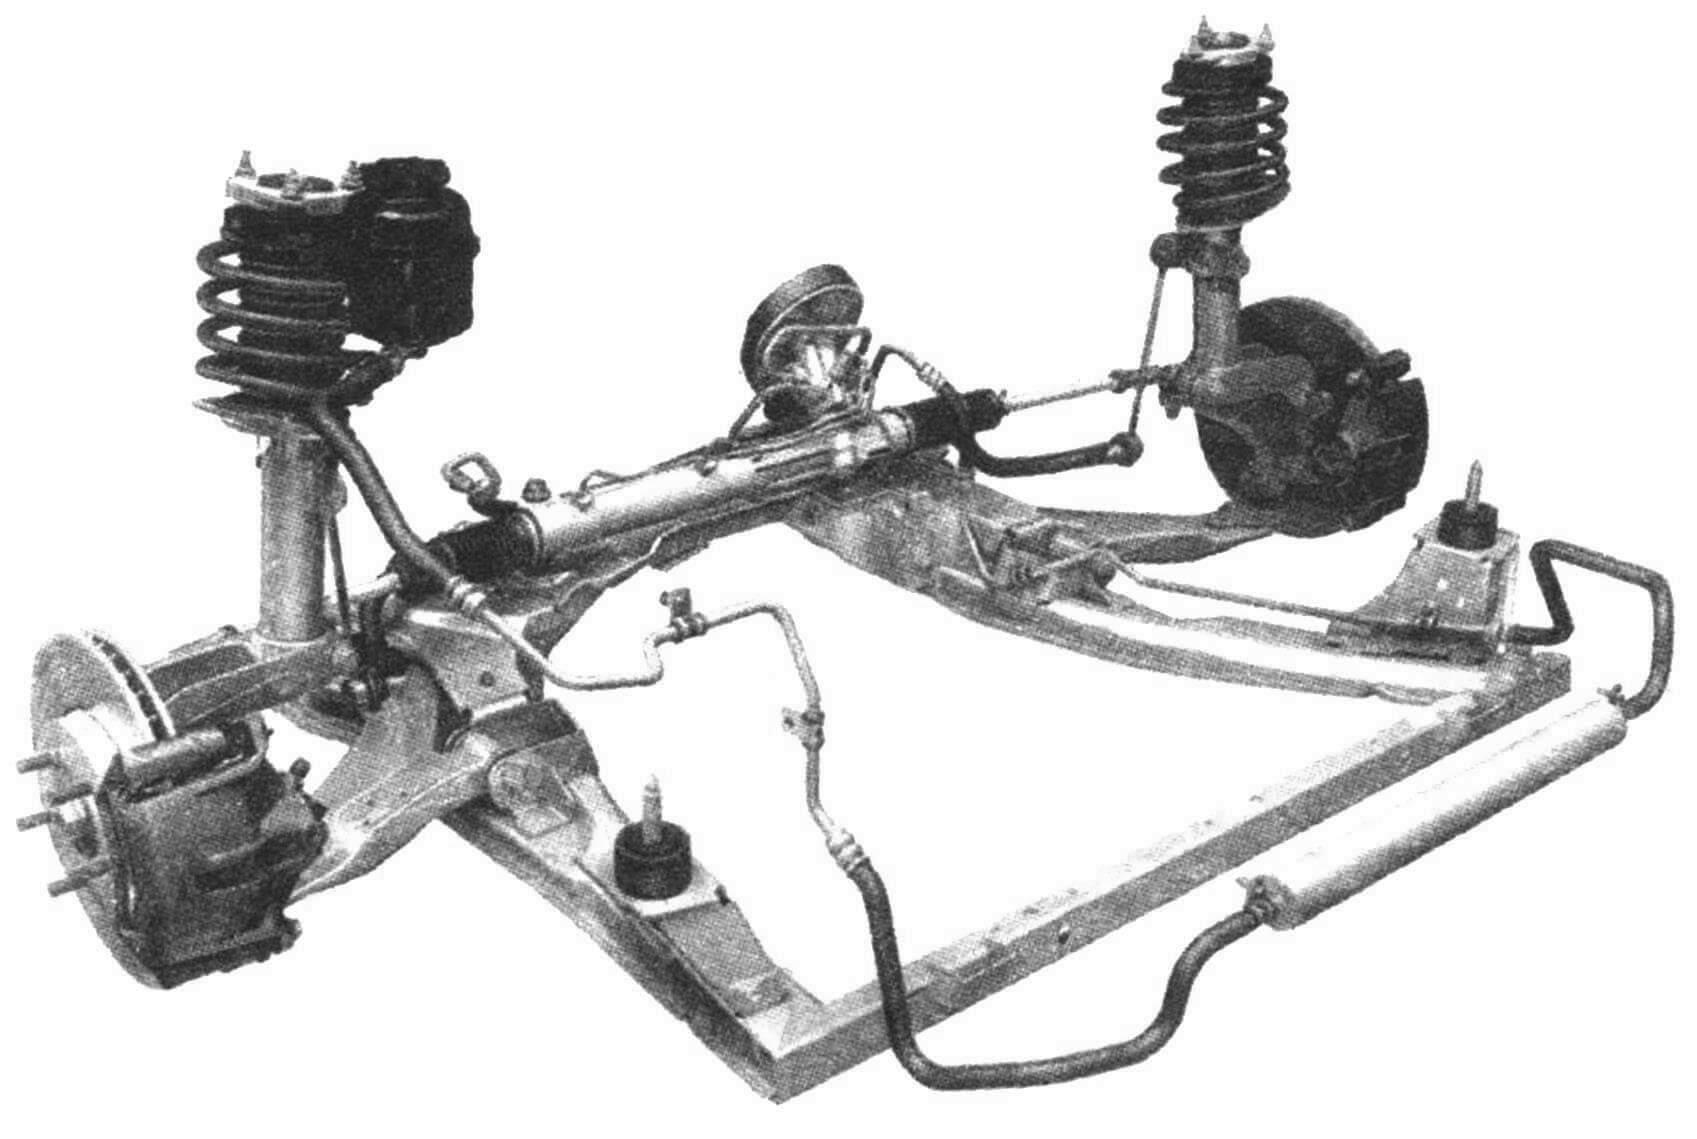 Передняя подвеска автомобиля Jaguar X-type со стойками McPherson